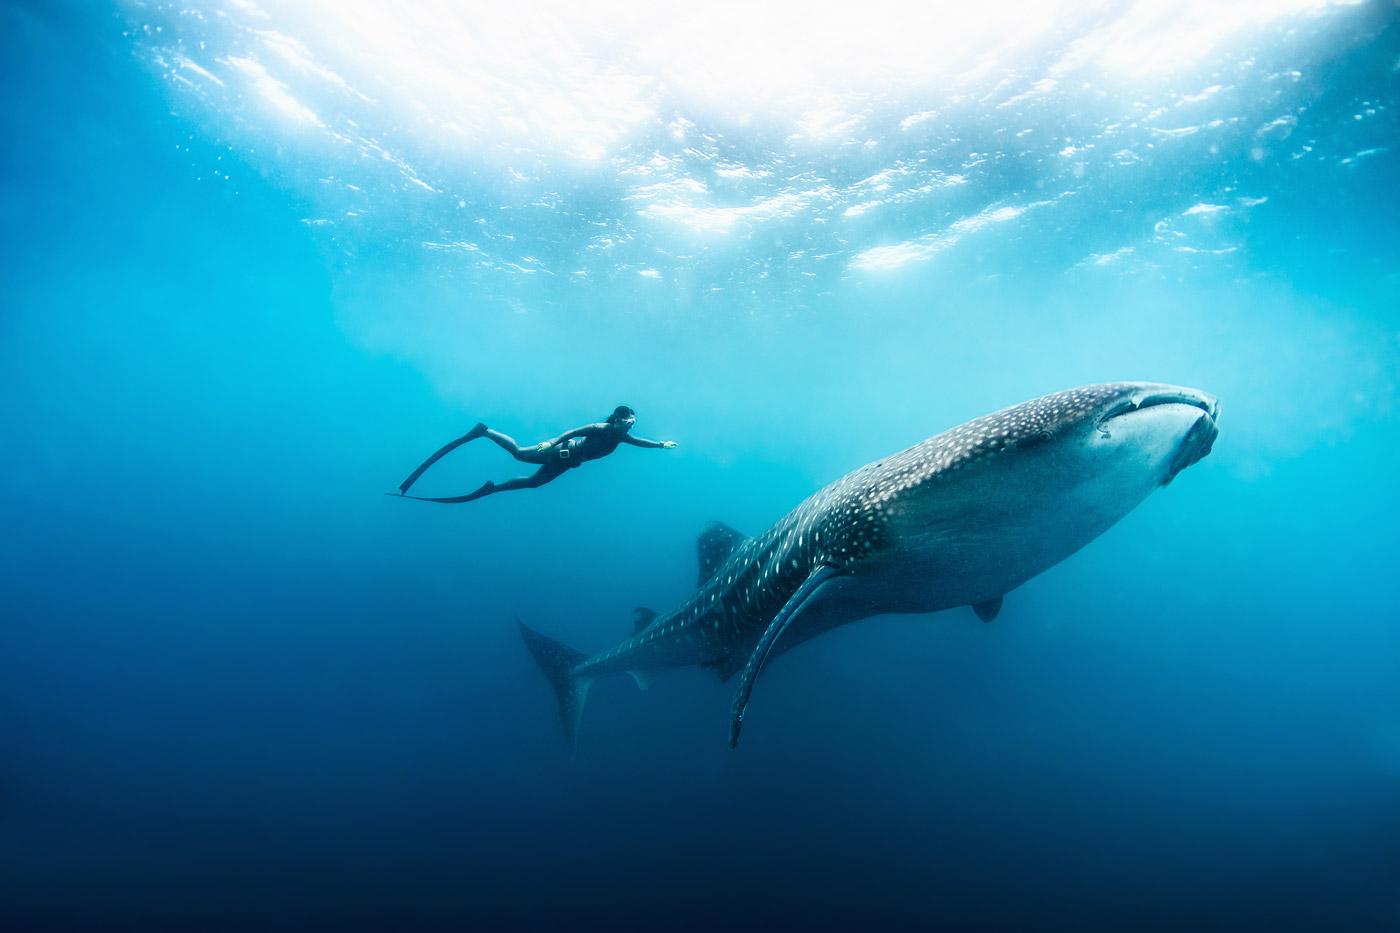 Apnoe-Taucher mit einem Walhai